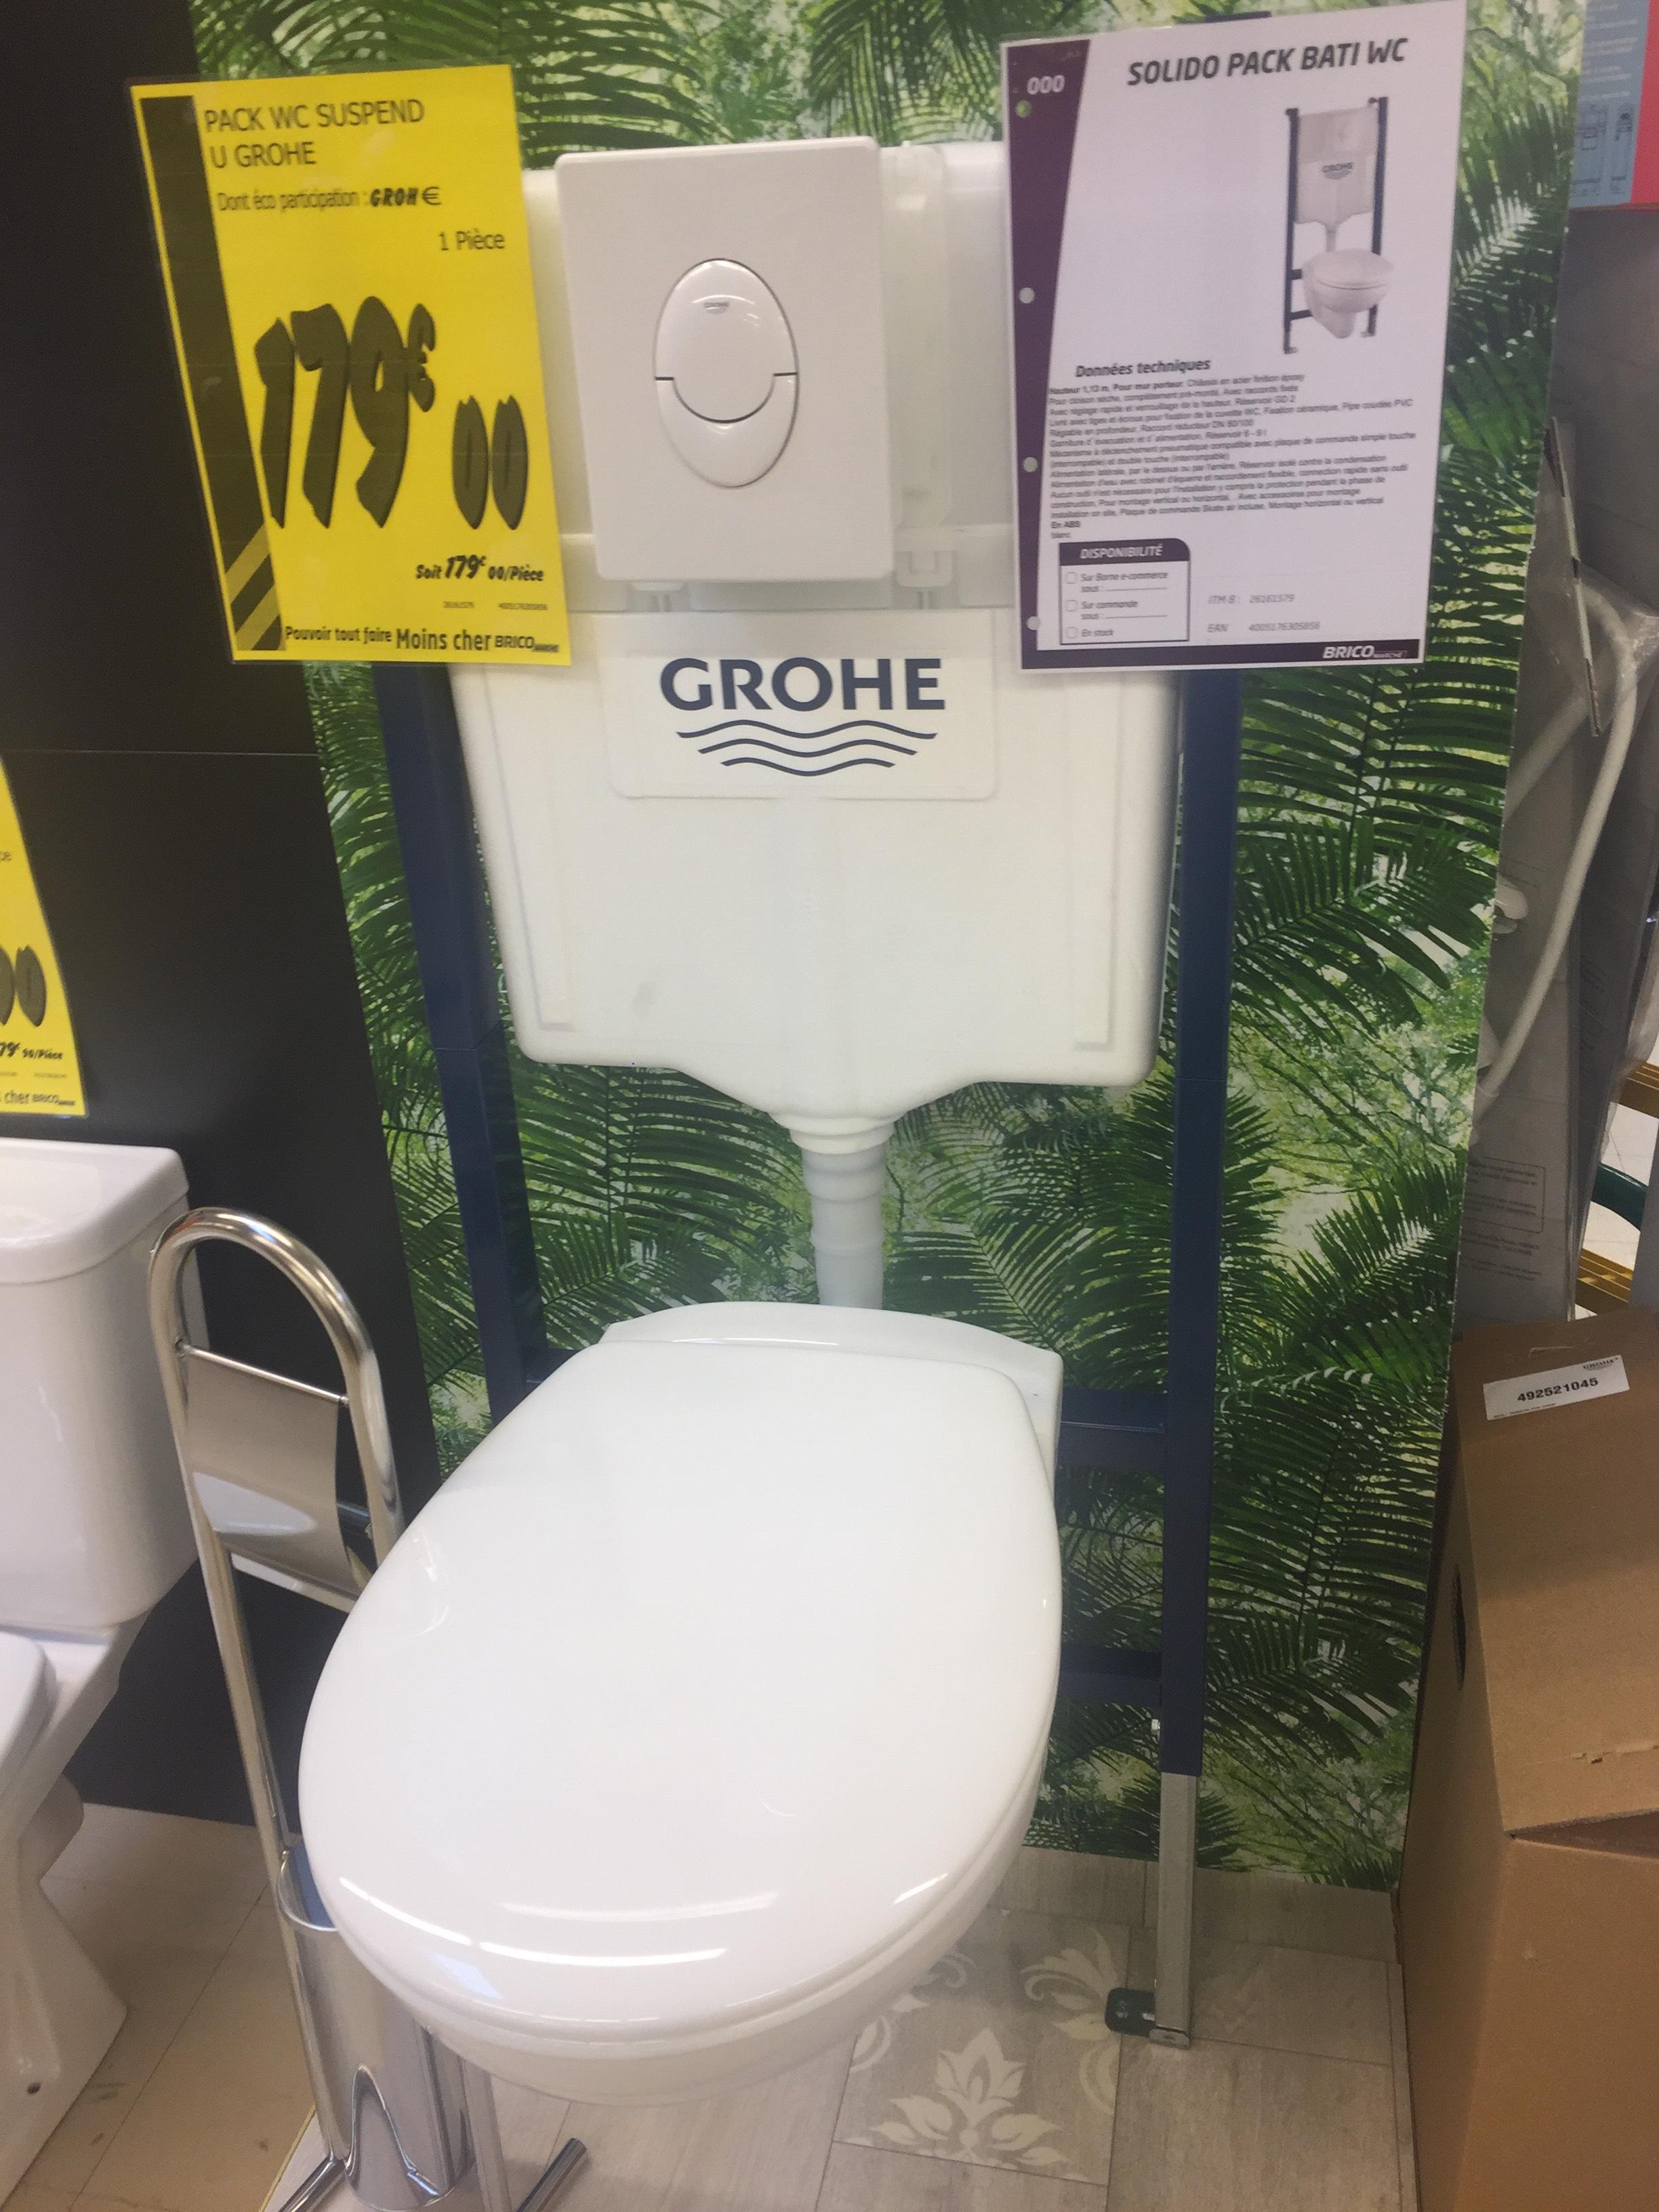 Pack WC suspendu Grohe Solido Bati - Saint-Marcel (27)